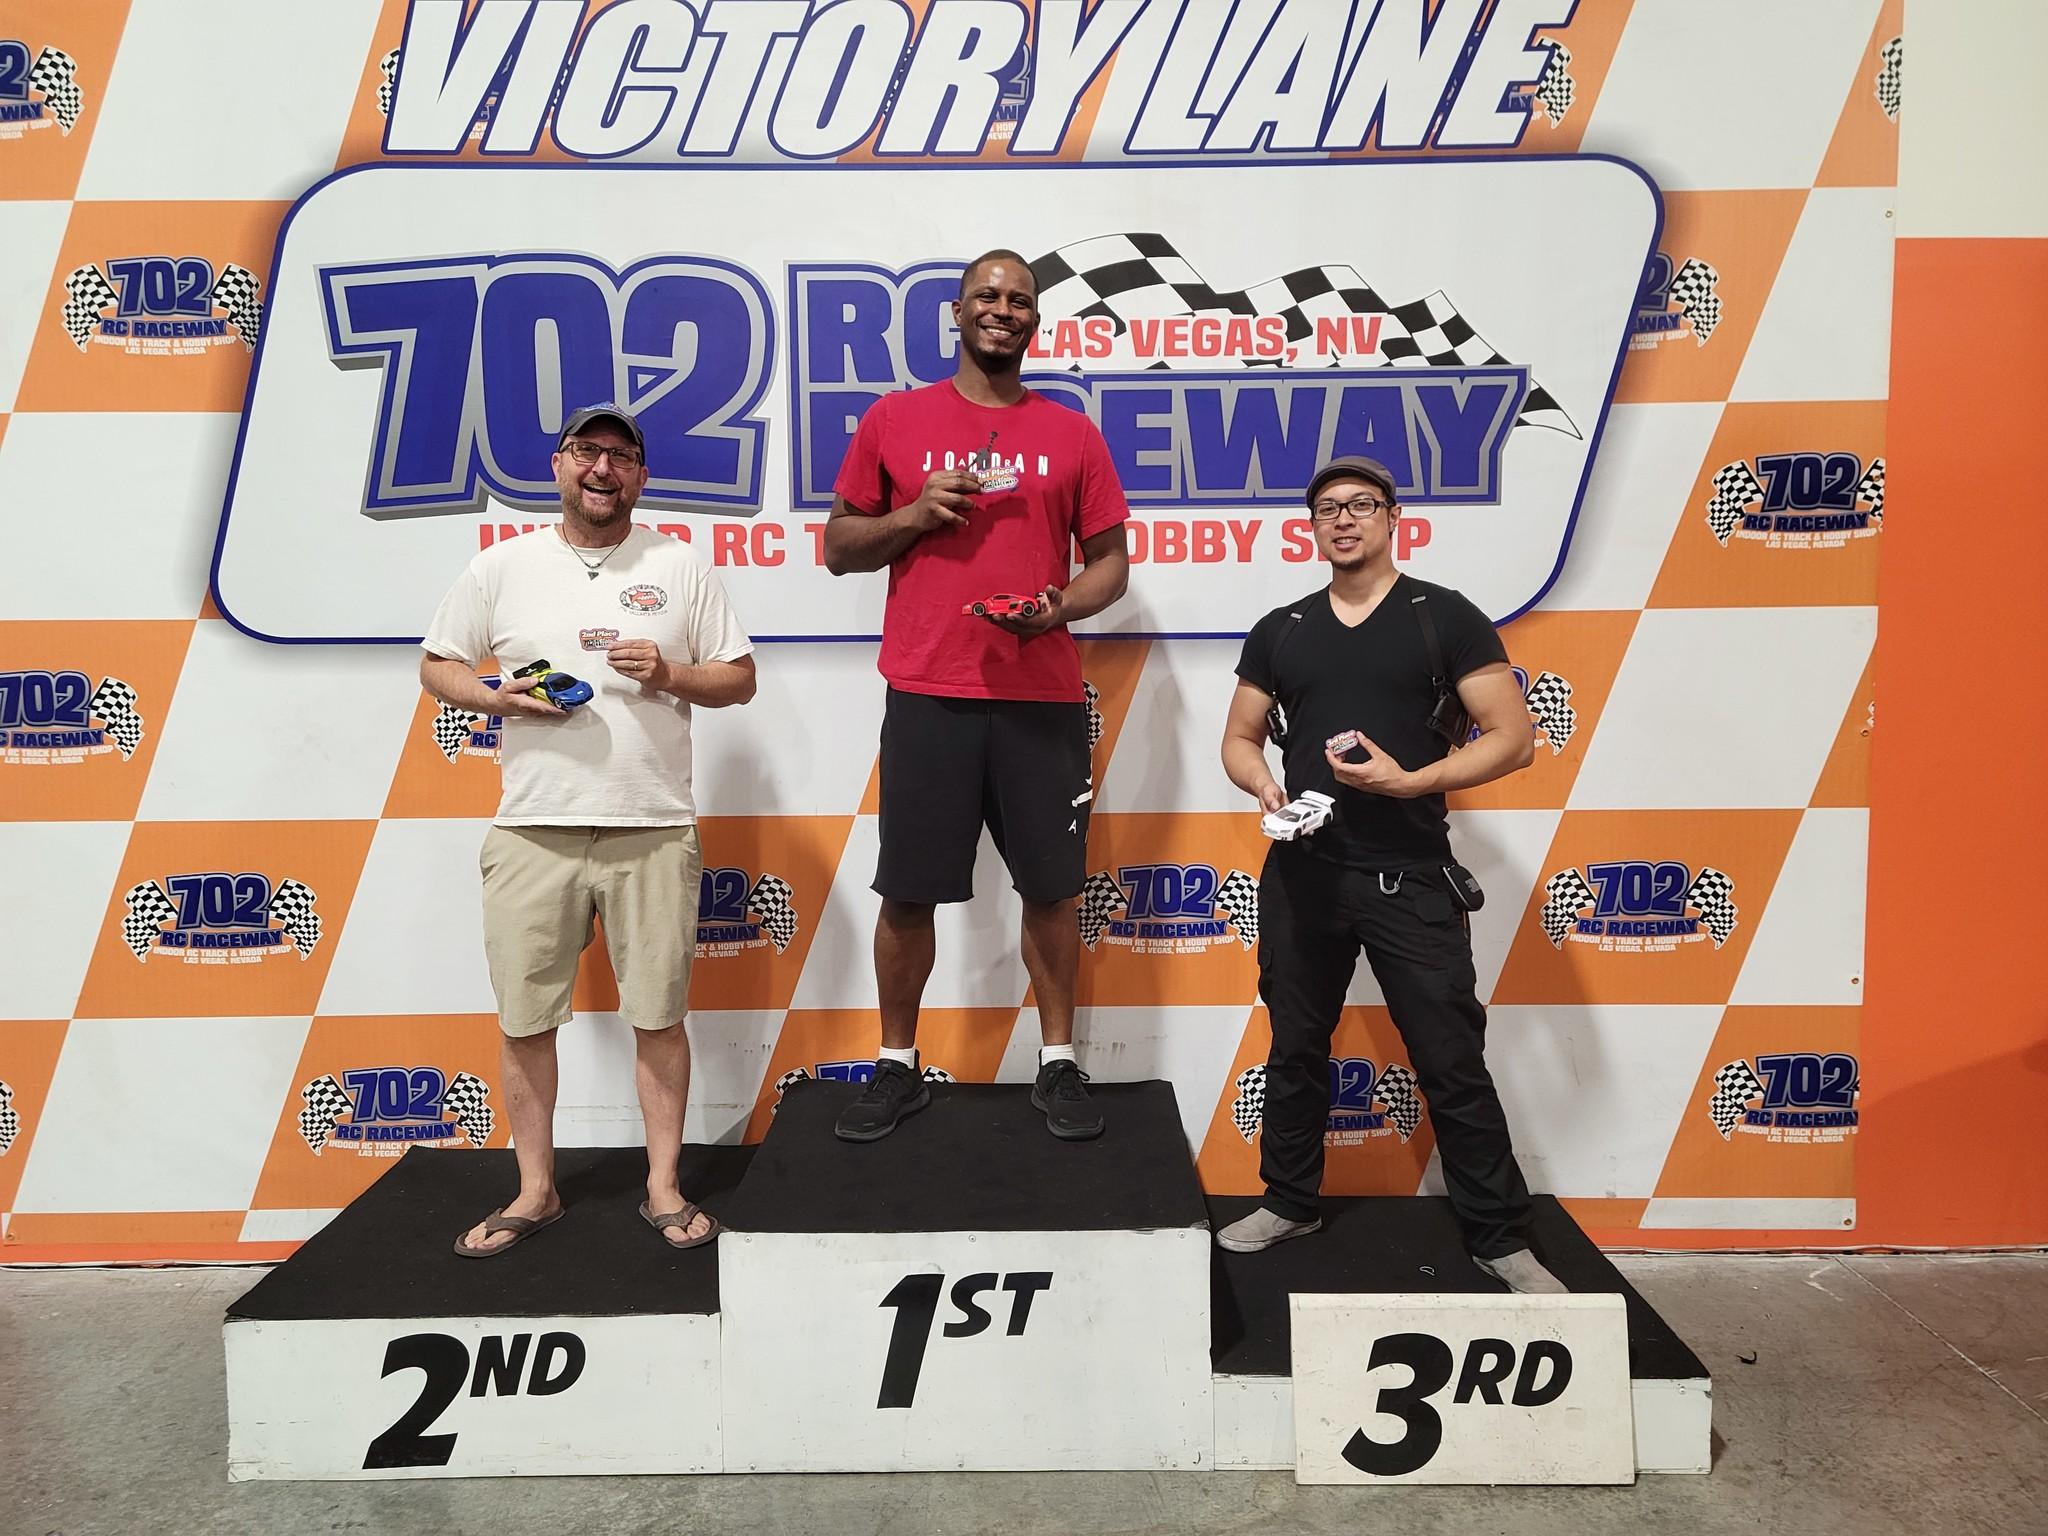 Las Vegas Nights Mini Z - Oct 2, 21 - Race Results